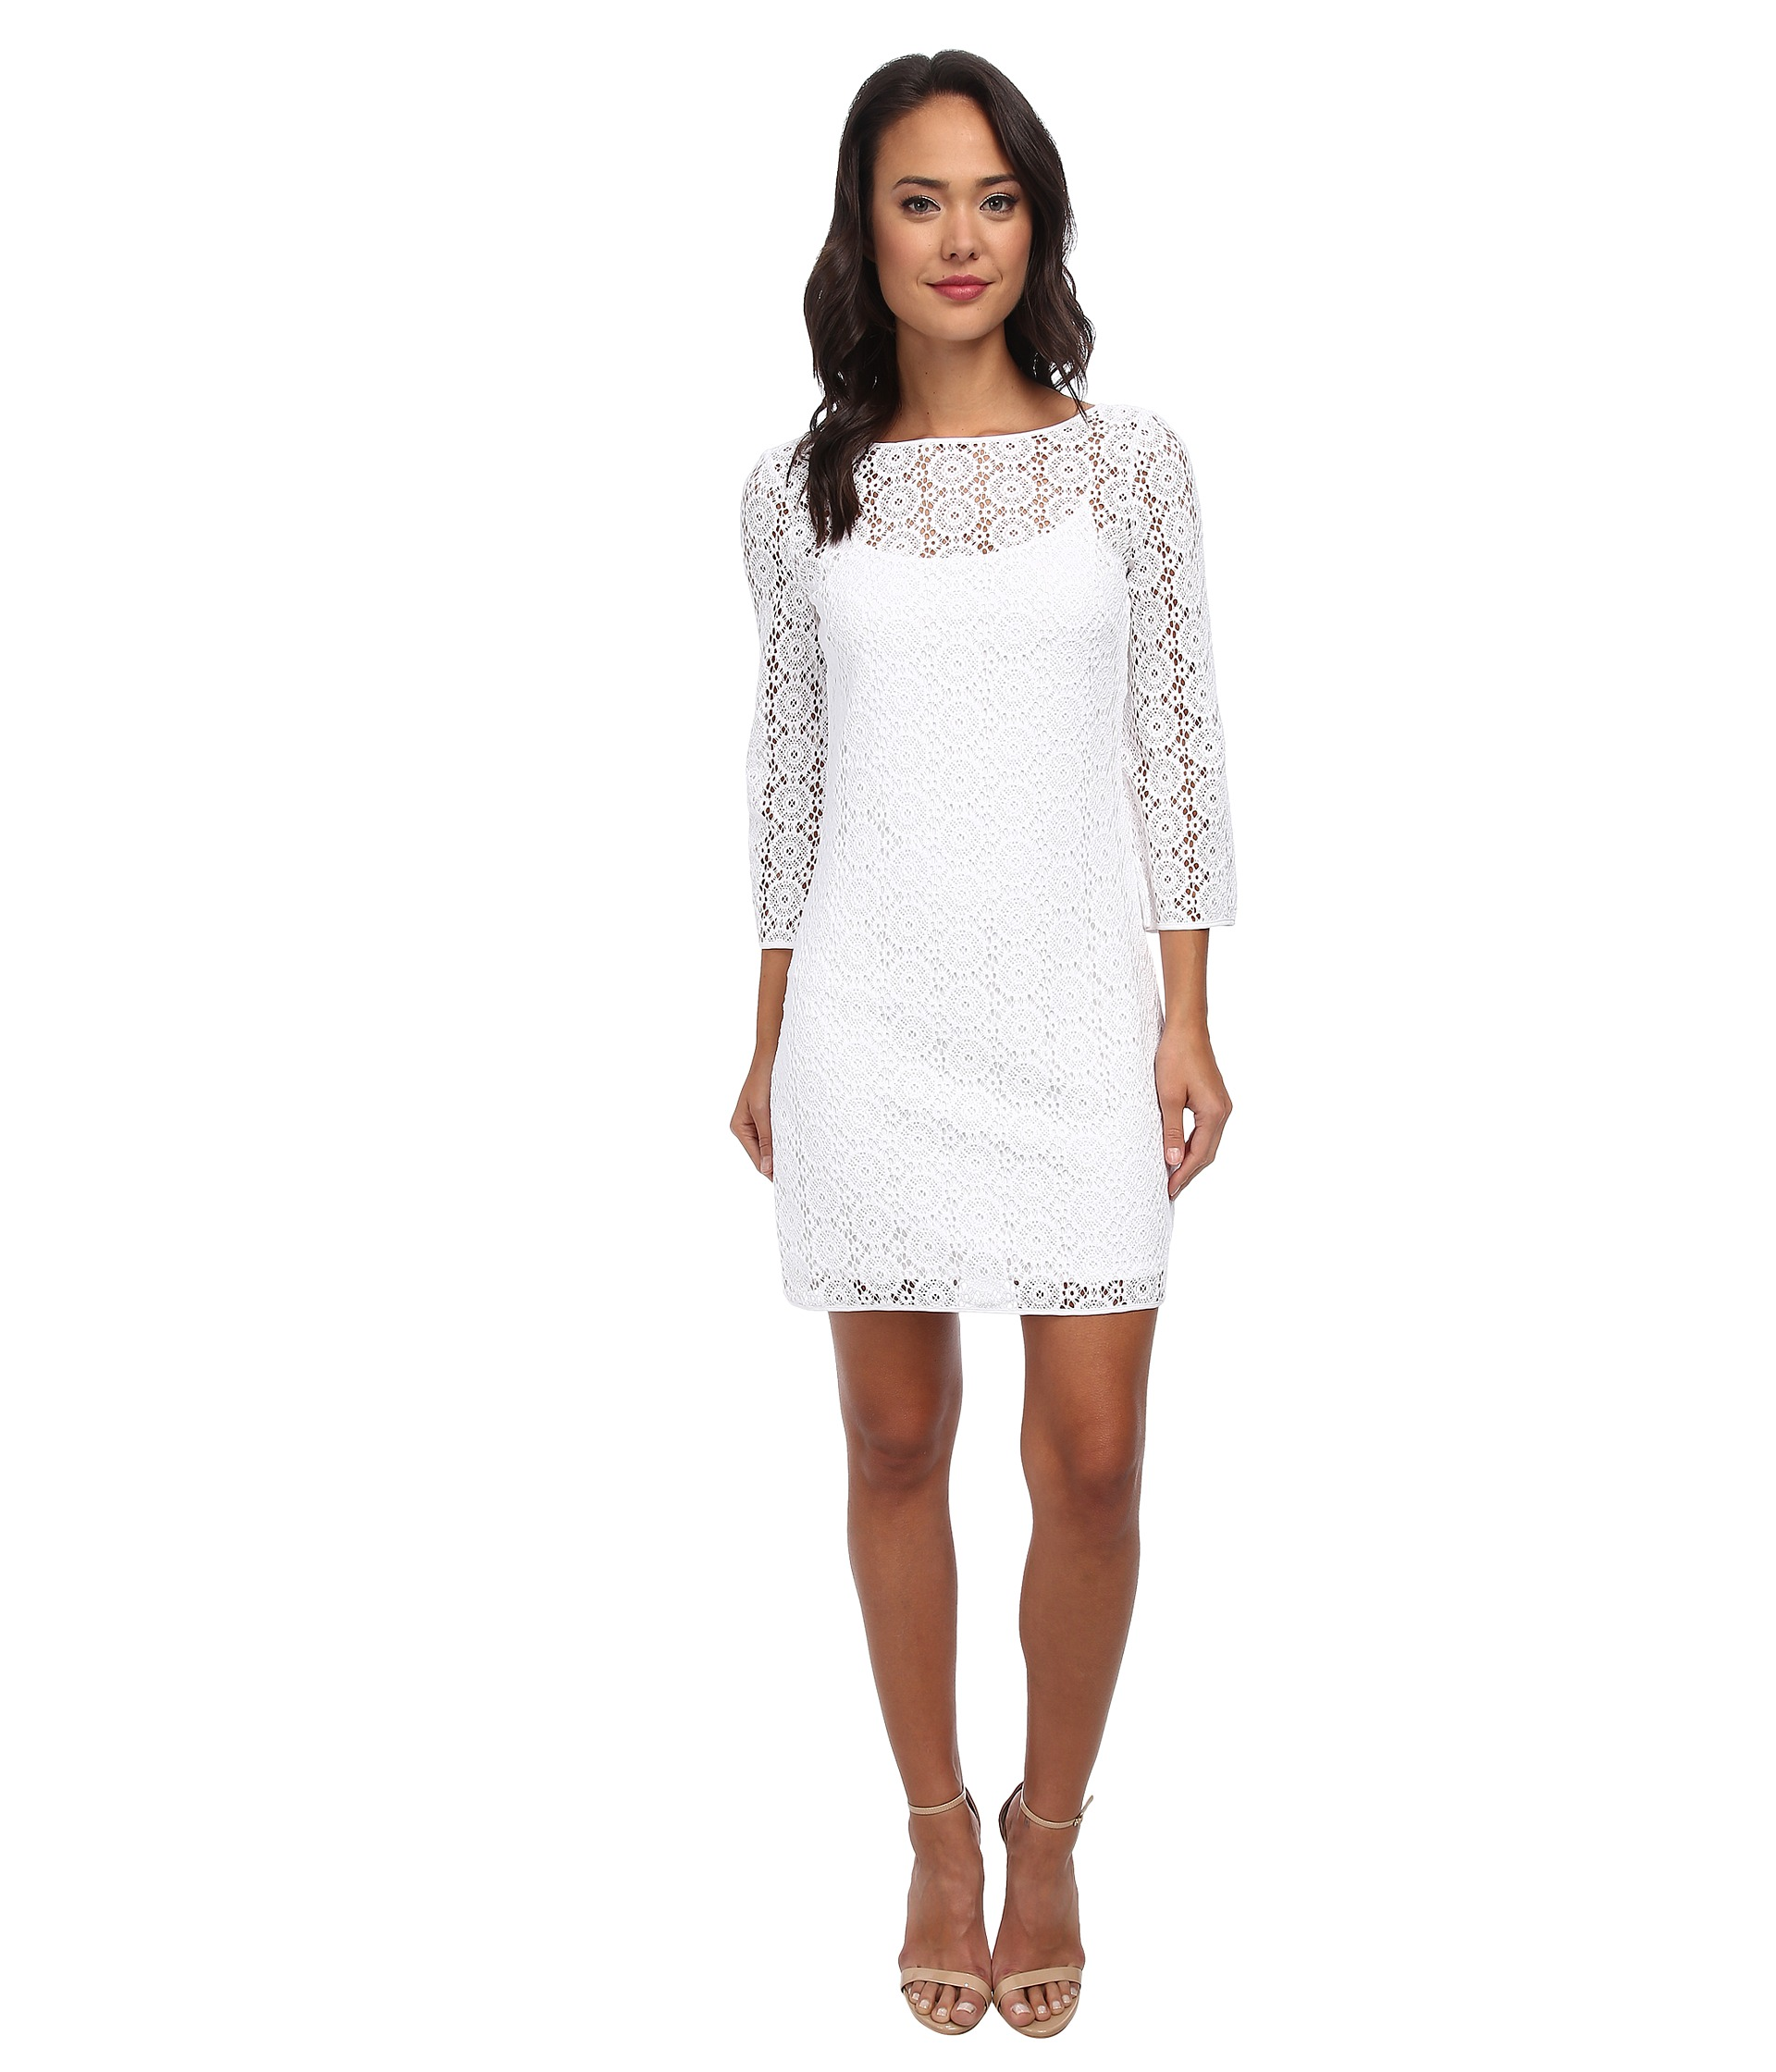 Lilly Pulitzer Topanga Dress Resort White Breakers Lace